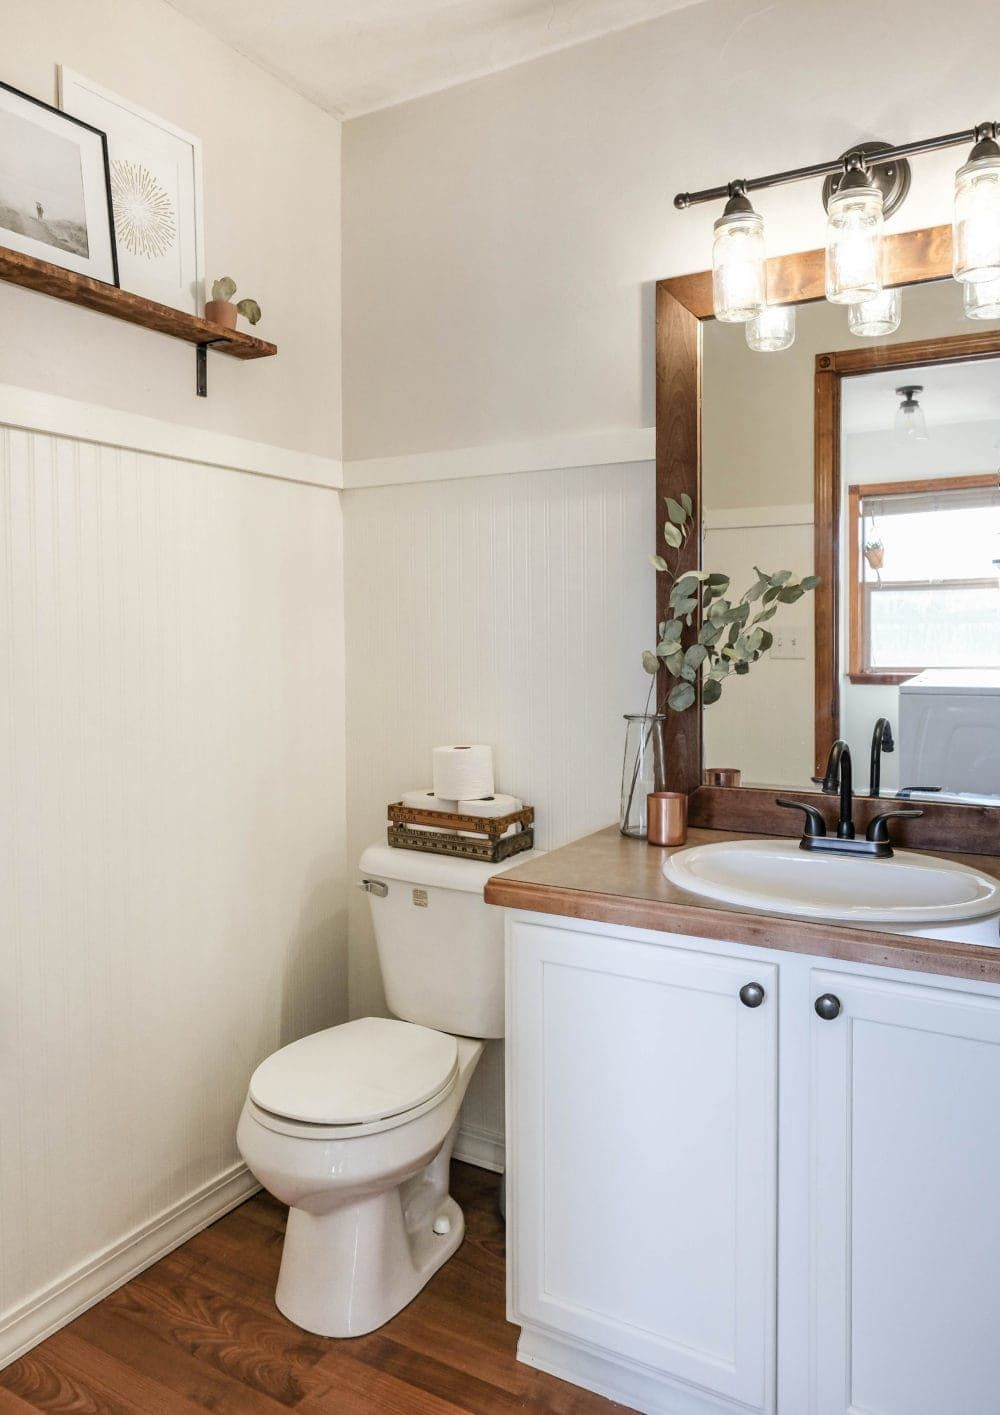 8 popular bathroom remodel ideas and trends for 2020 diy on bathroom renovation ideas 2020 id=28364